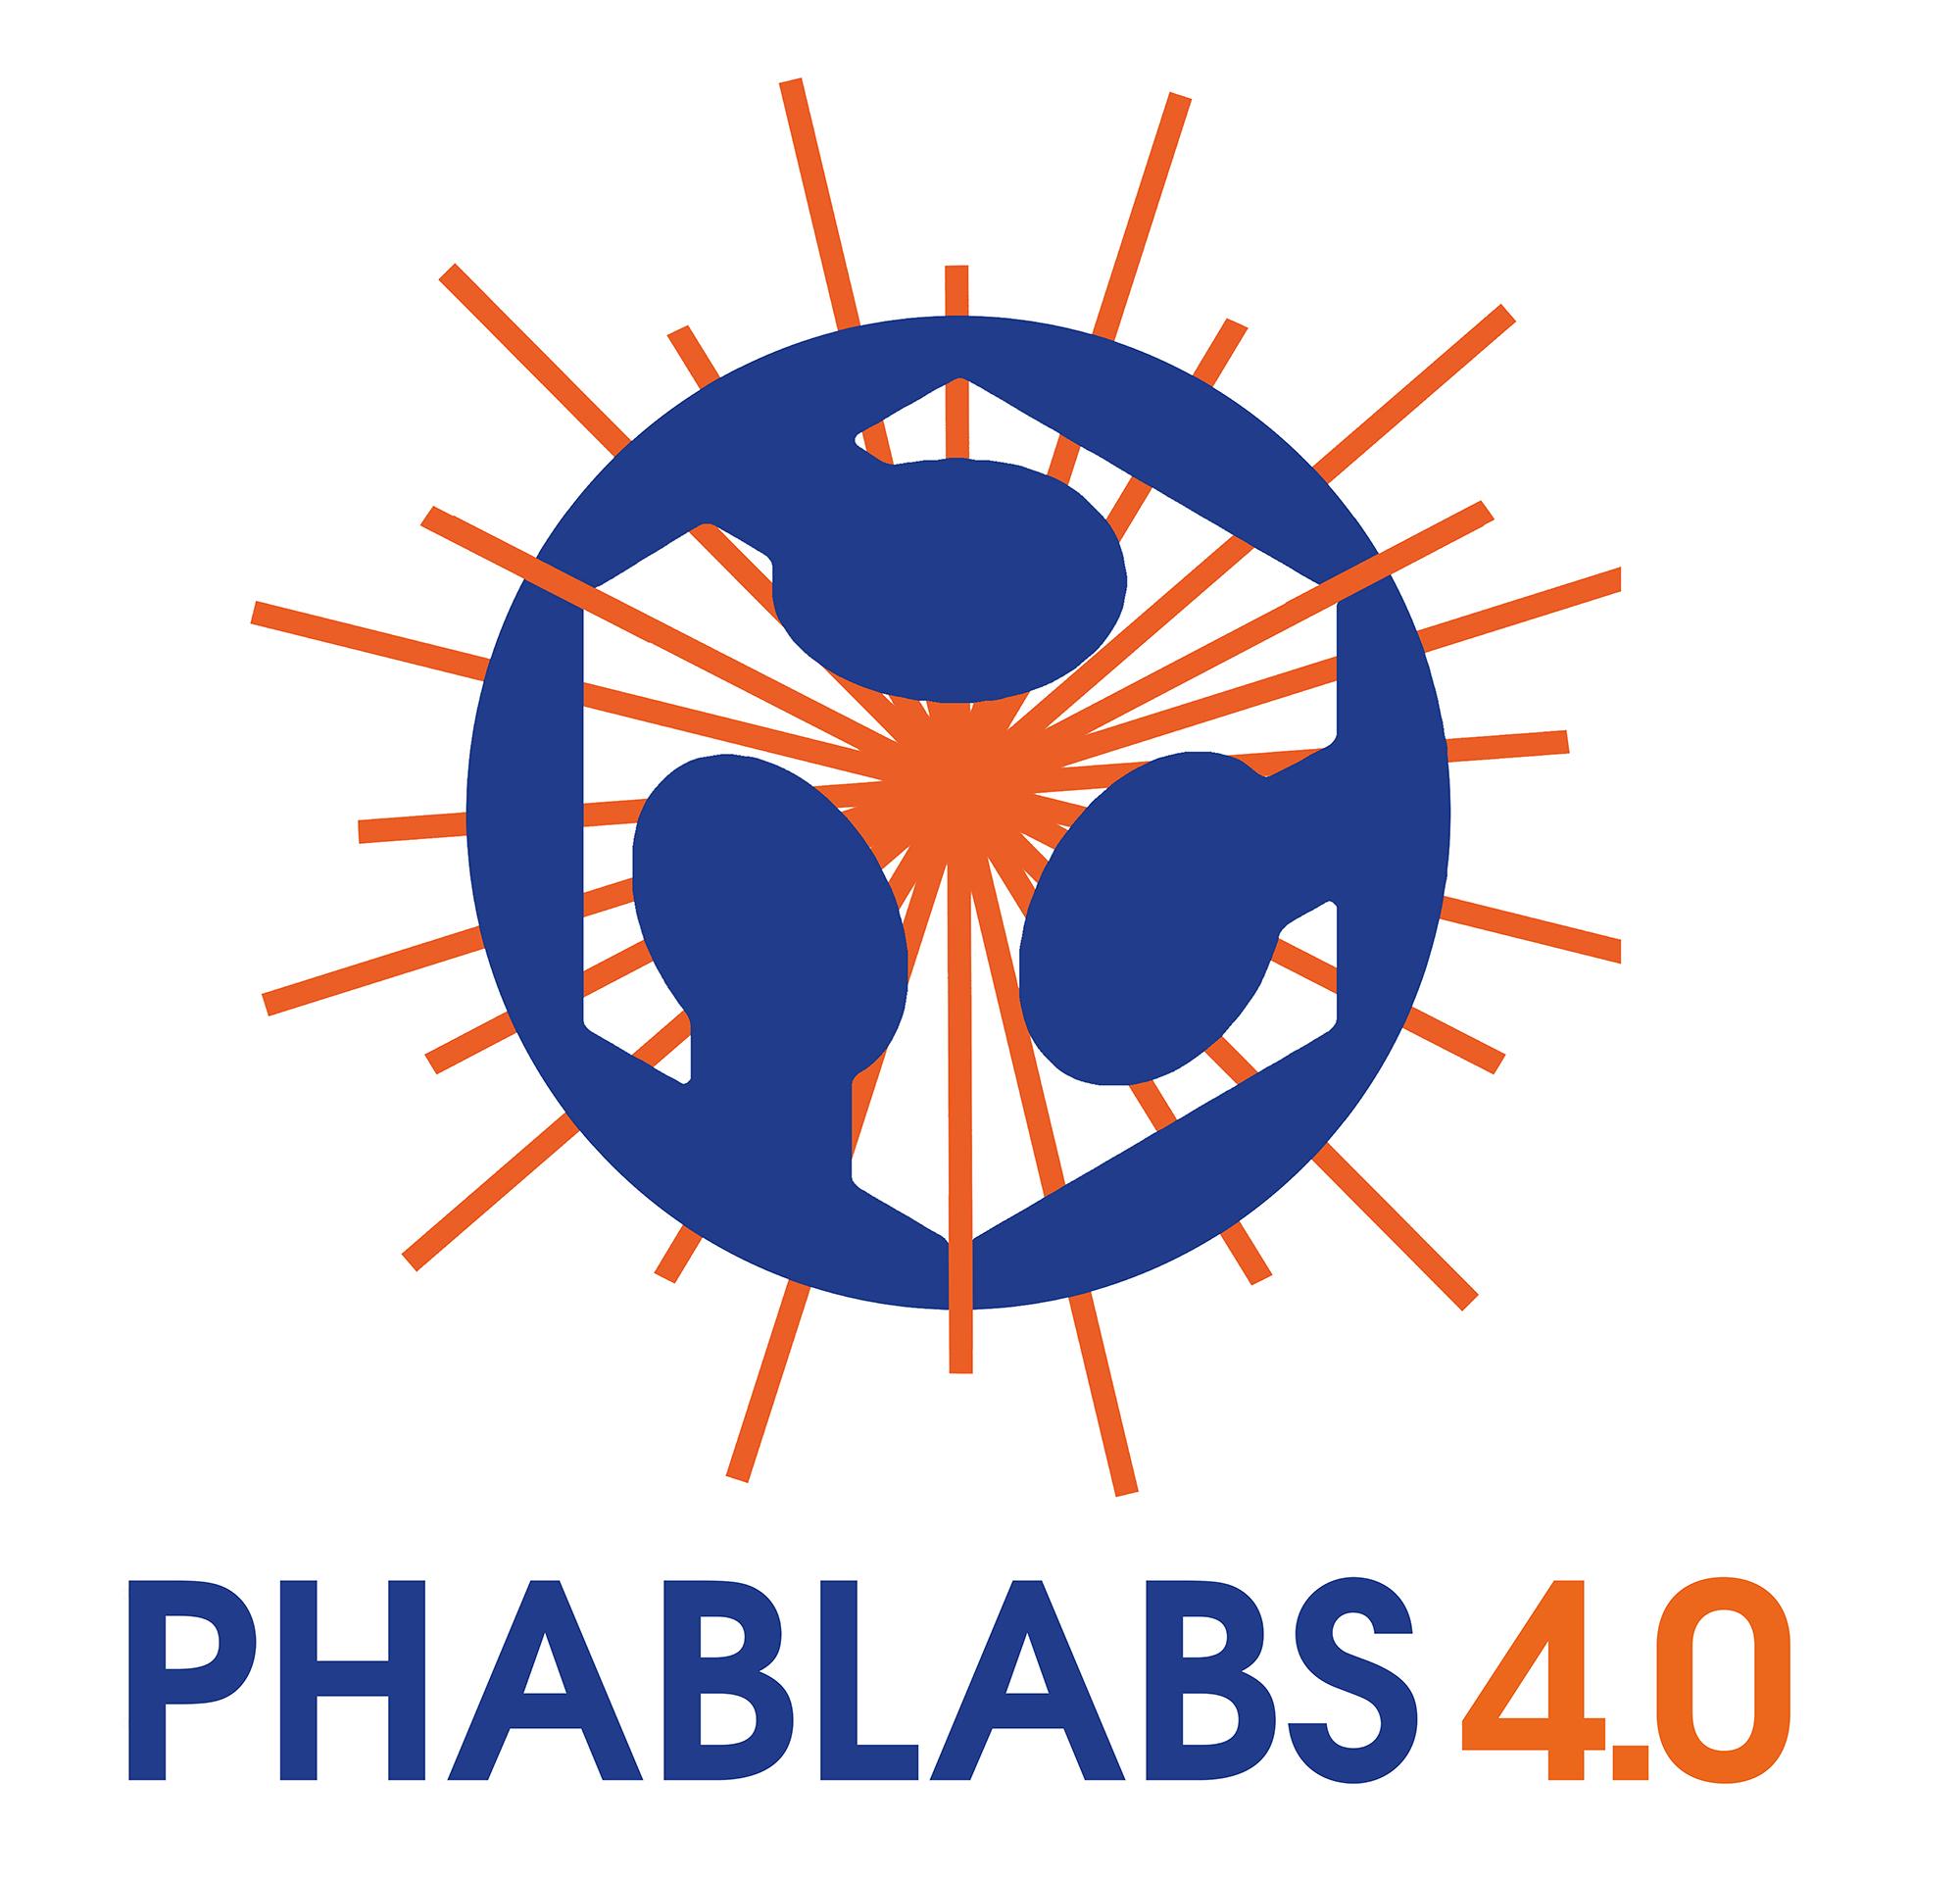 phablabs 4.0 logo